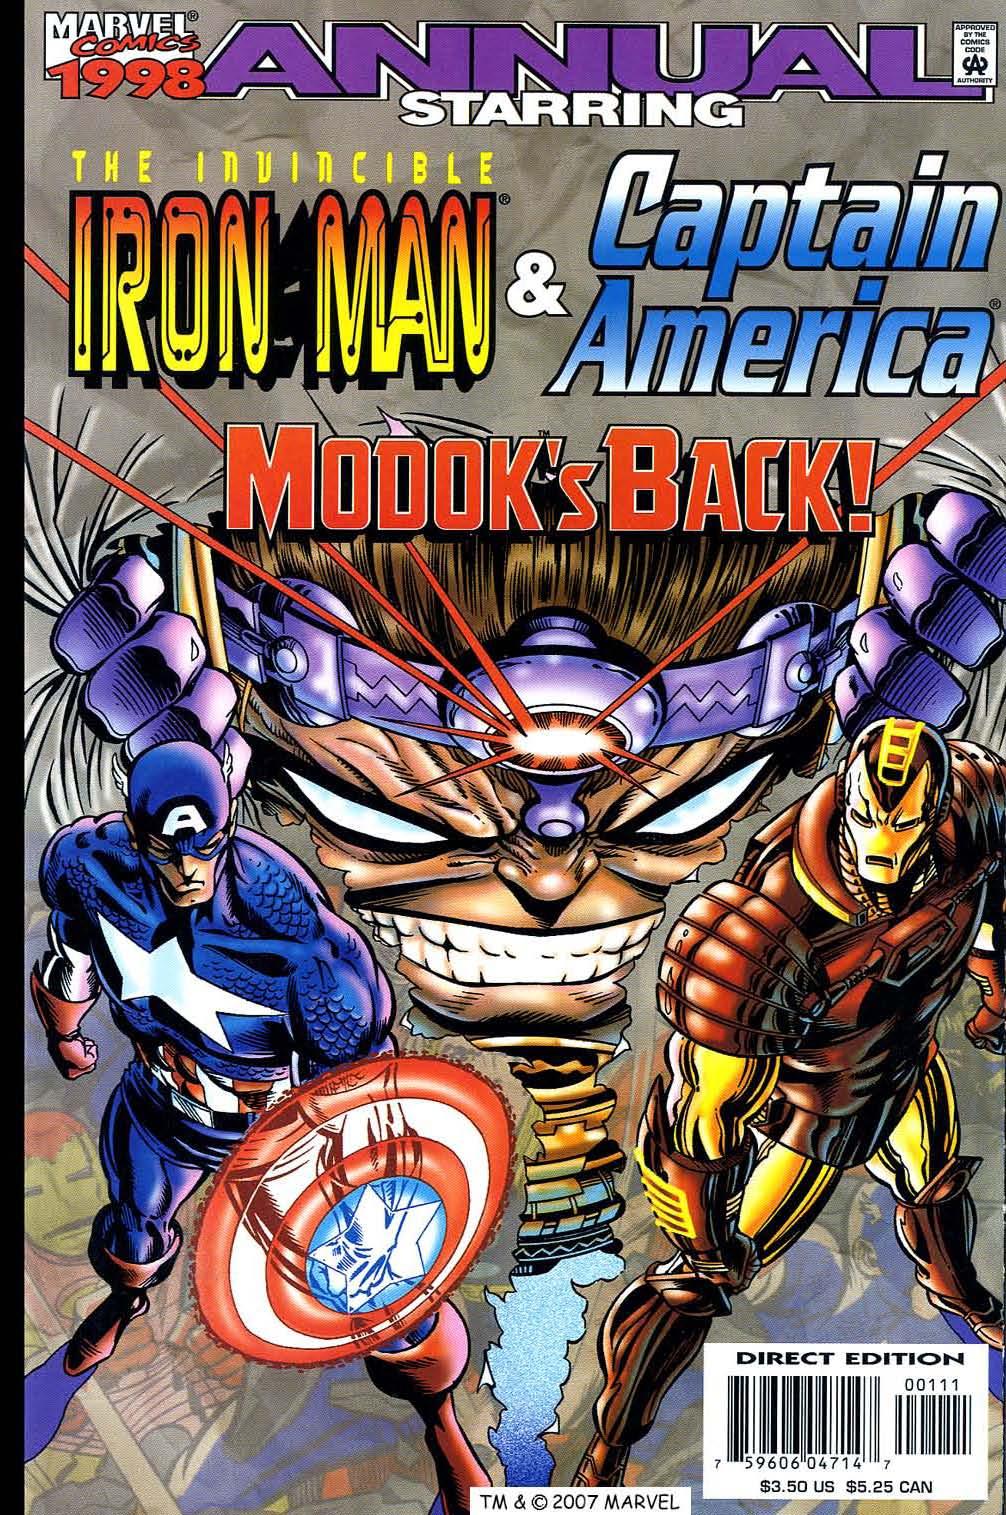 Captain America (1998) Annual_1998 Page 1